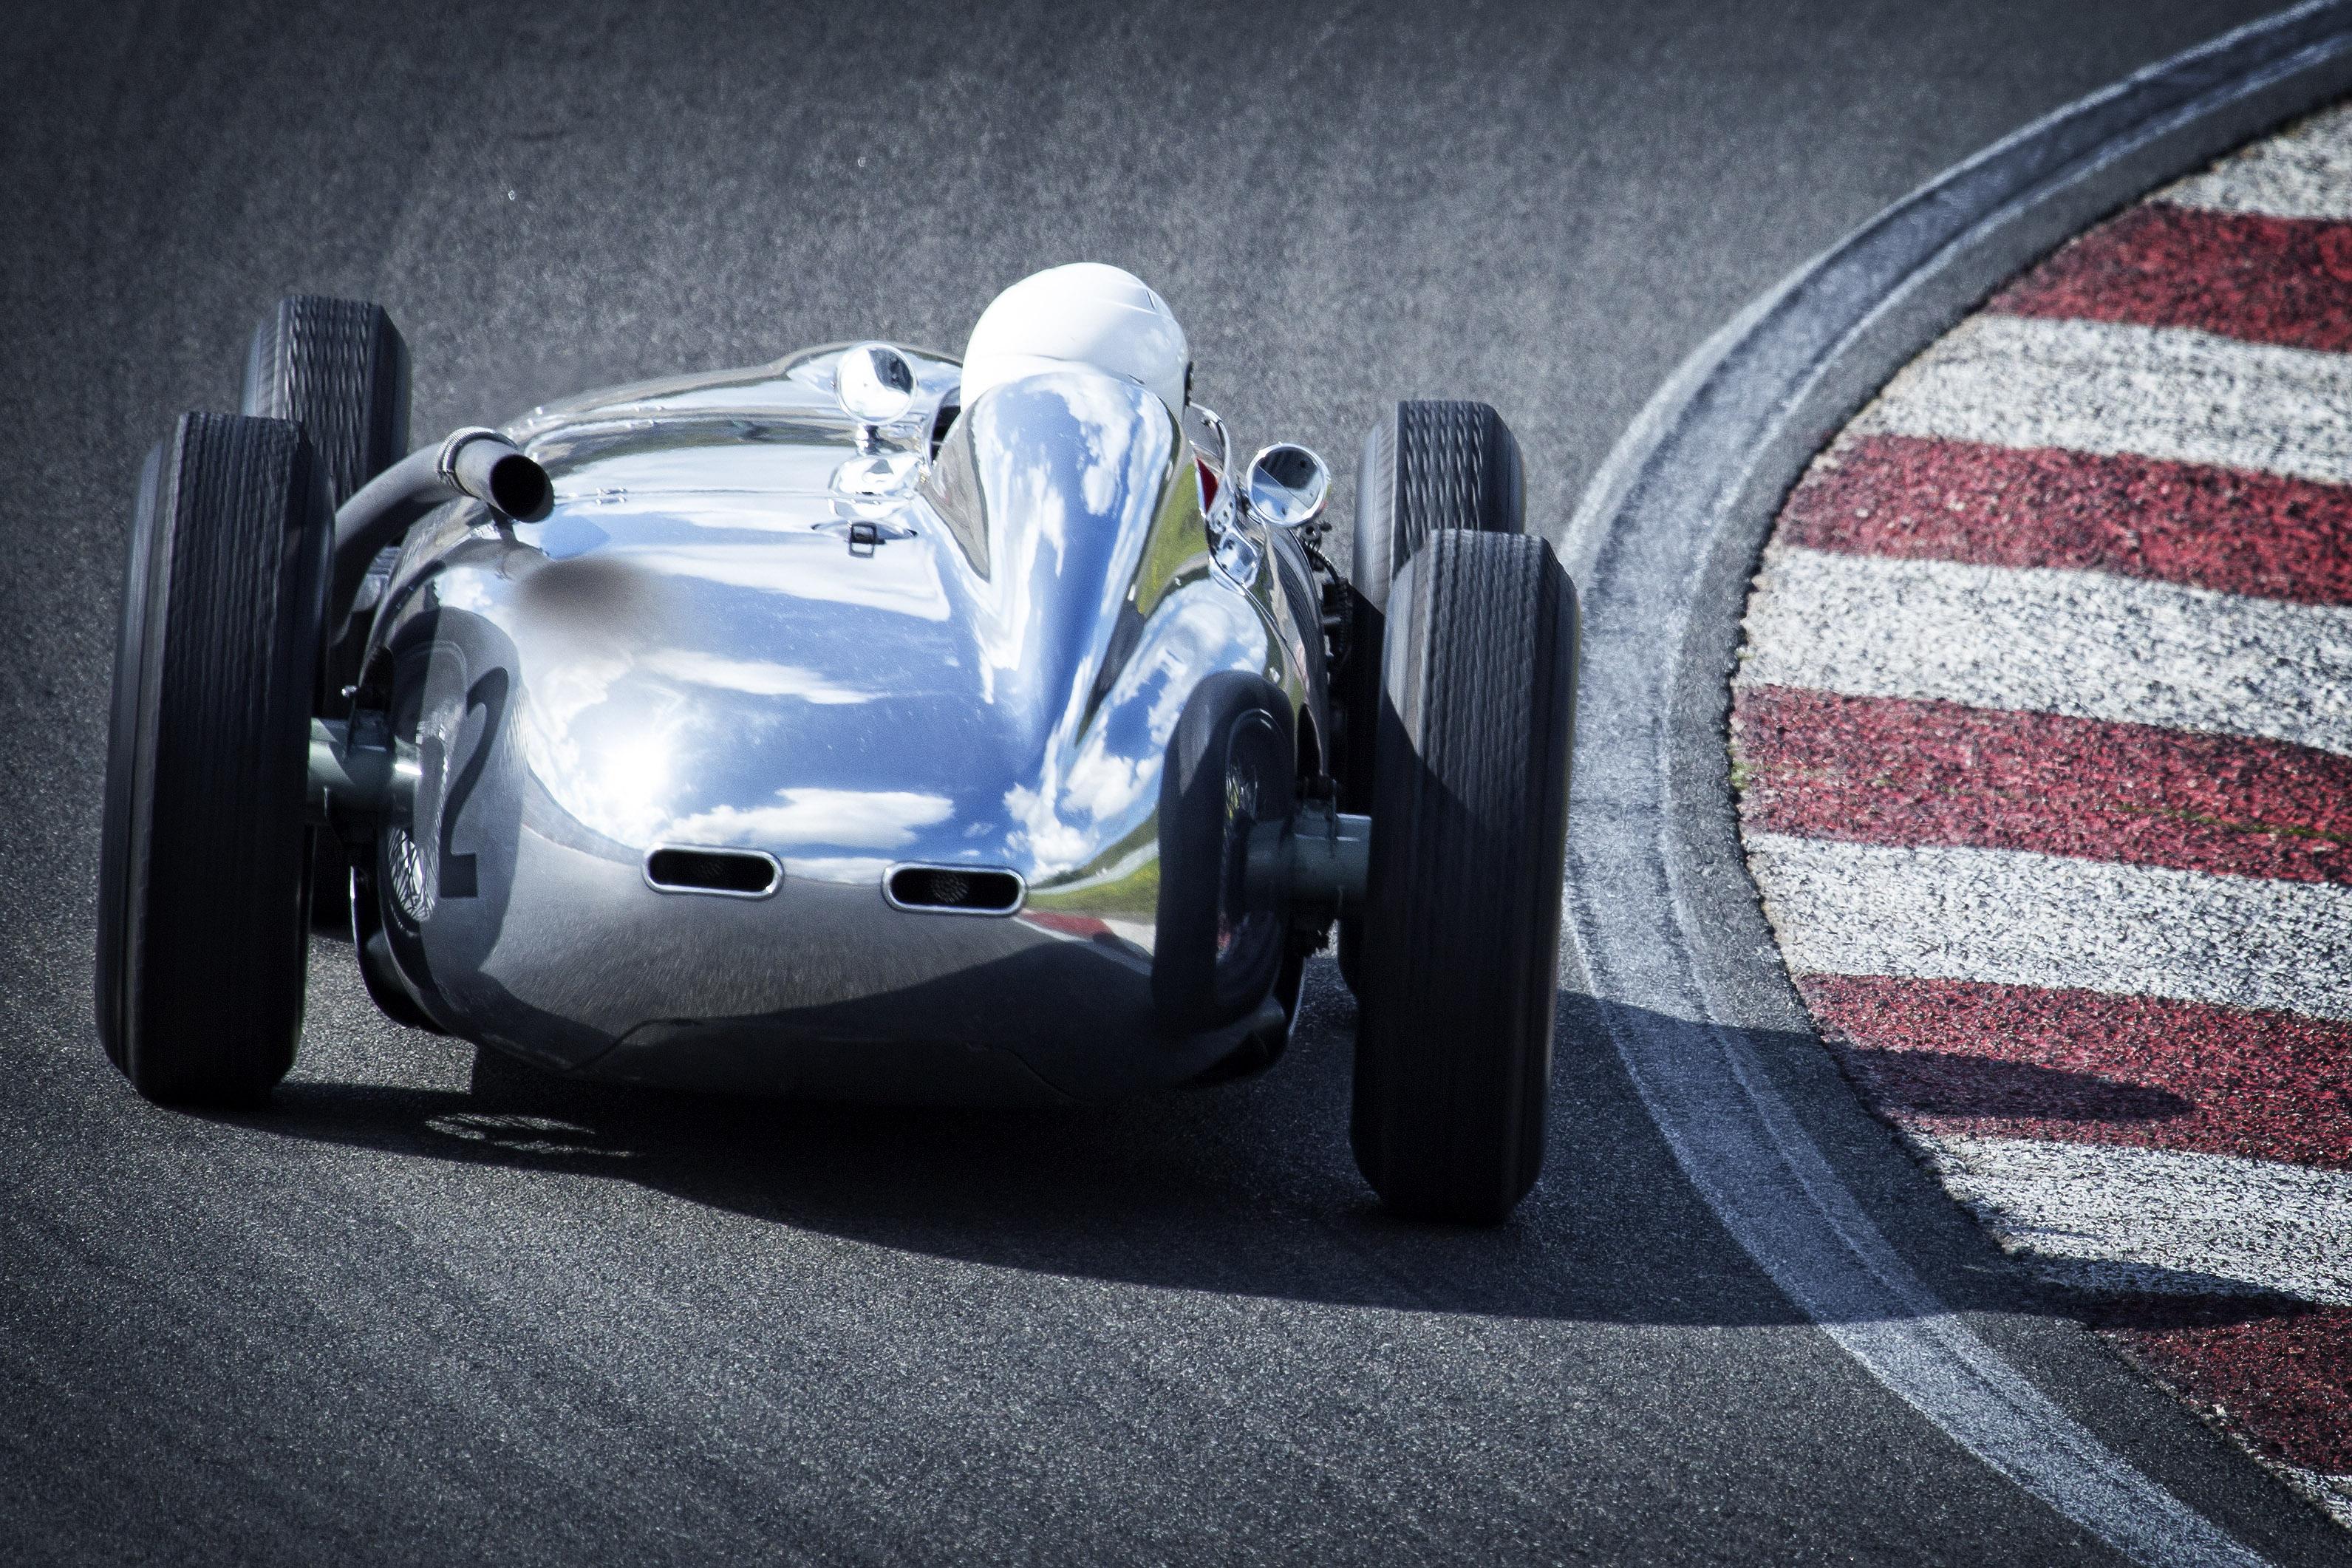 Gray Racing Car on Lane